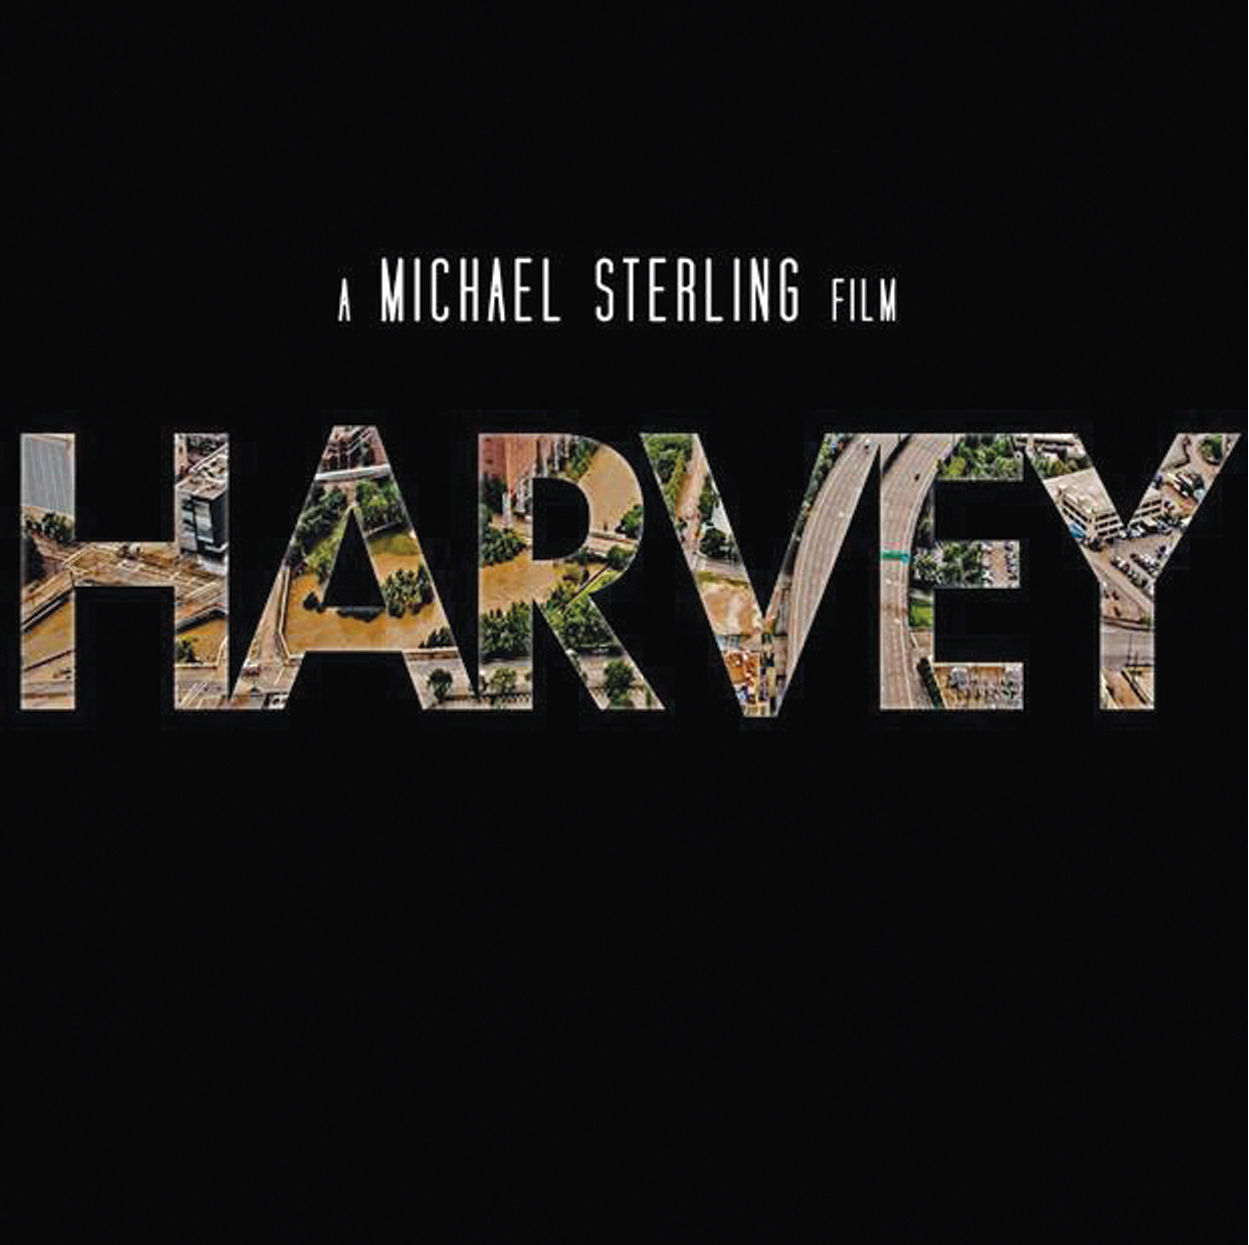 Harvey movie lhlyqx